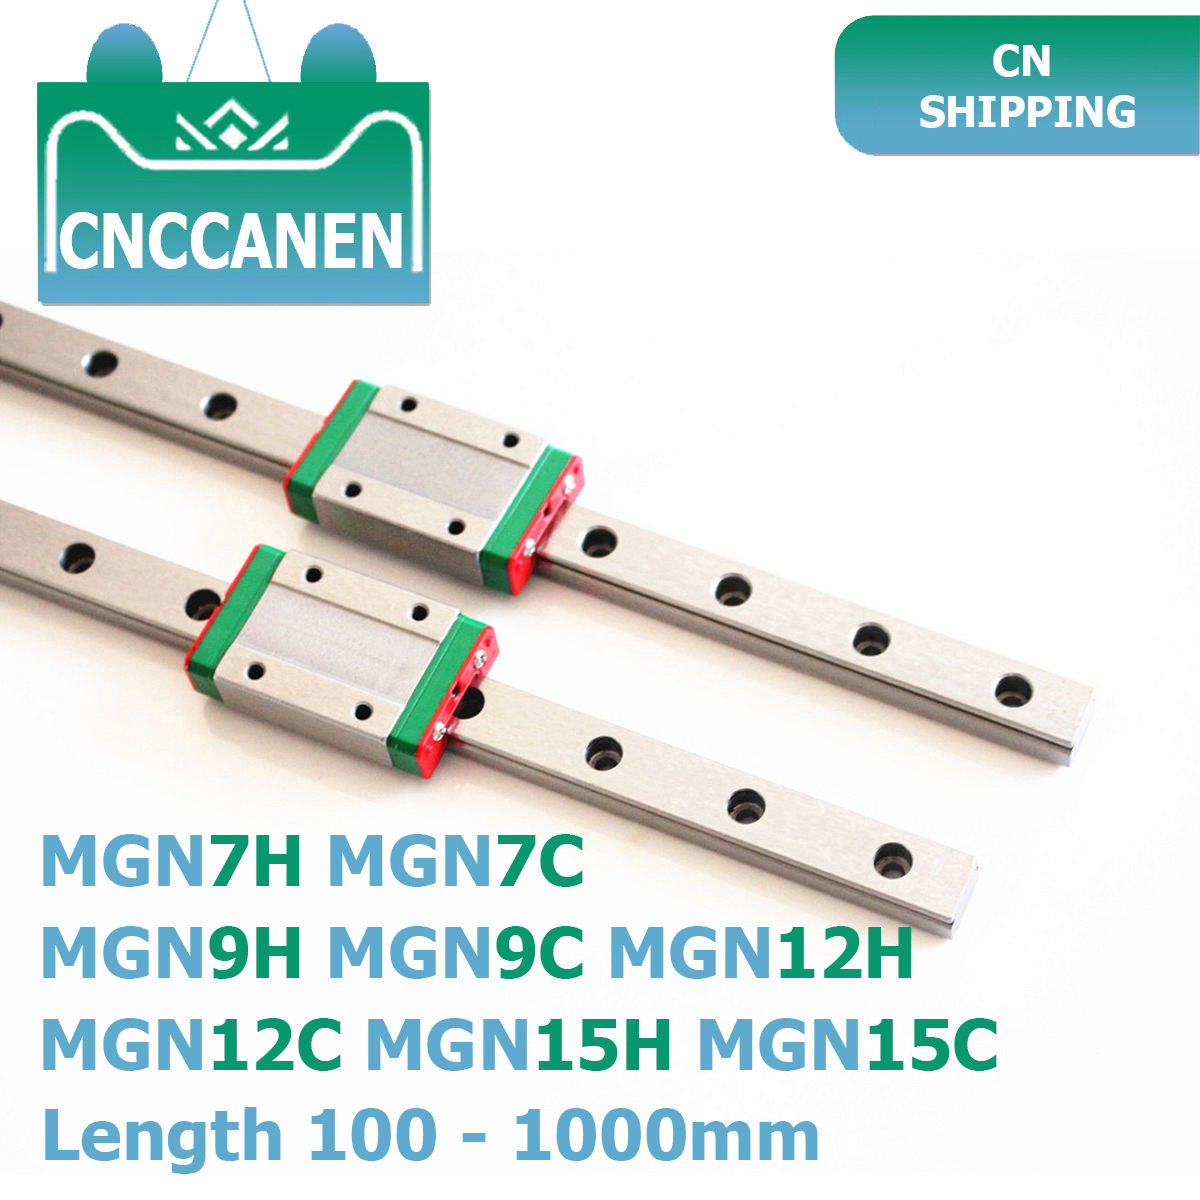 MGN7 MGN9 MGN12 MGN15 100-1000mm Miniature Linear Rail Slide 2PCS MGN9 Linear Guide +2PCS MGN9H Or MGN9C Carriage 3D Printer CNC